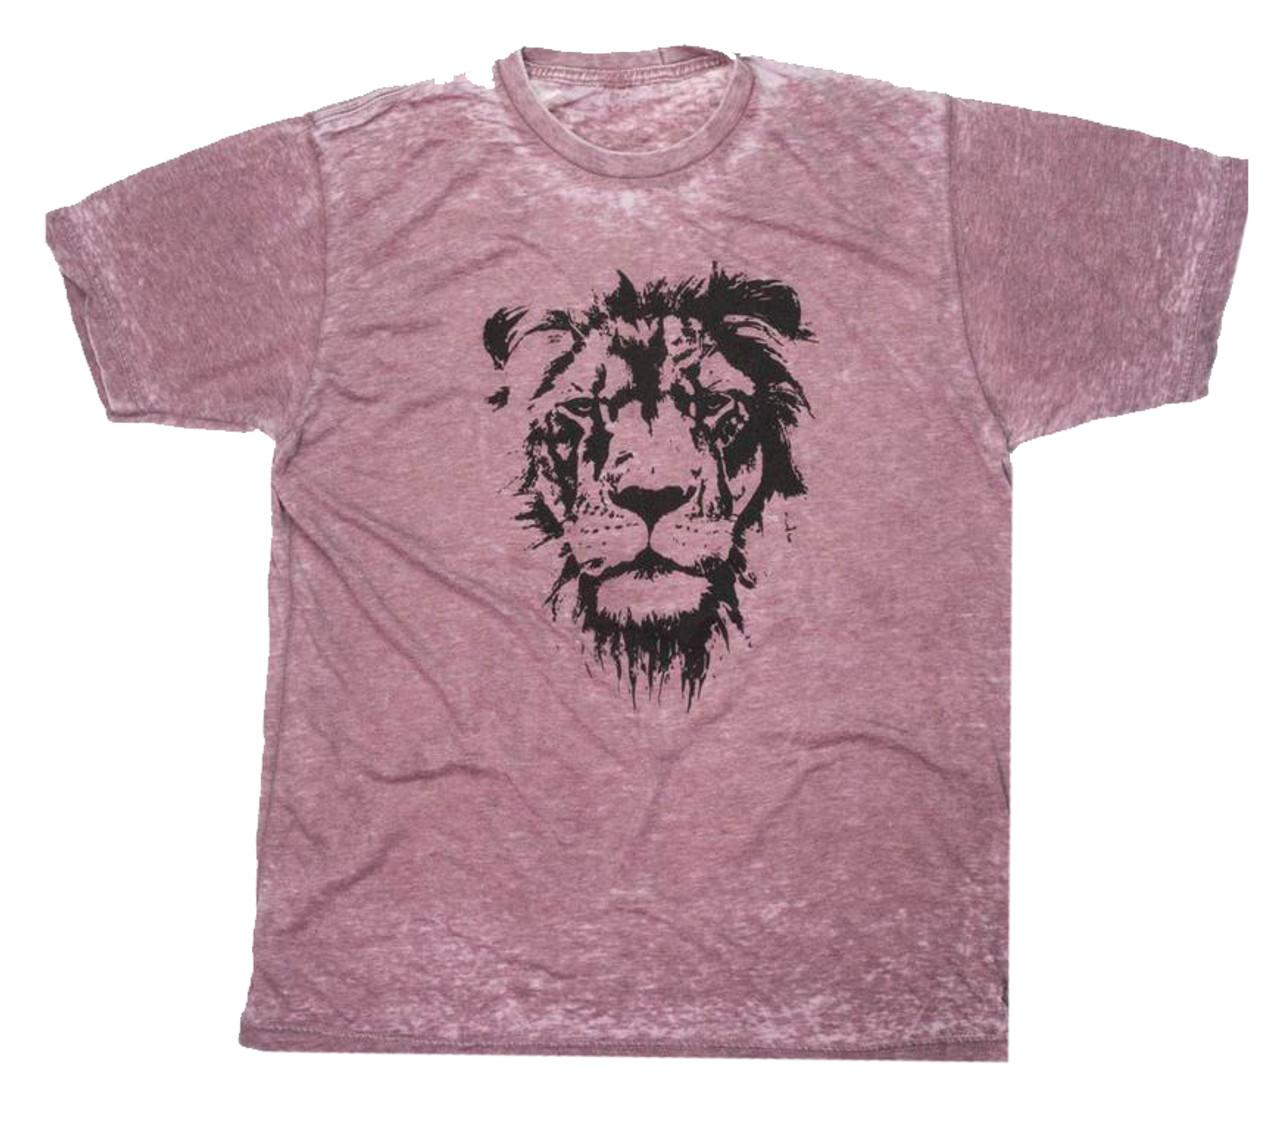 1dc8fa9eba Crazy Cool Threads Lion of Judah Acid Wash T-shirt - Trenz Shirt Company